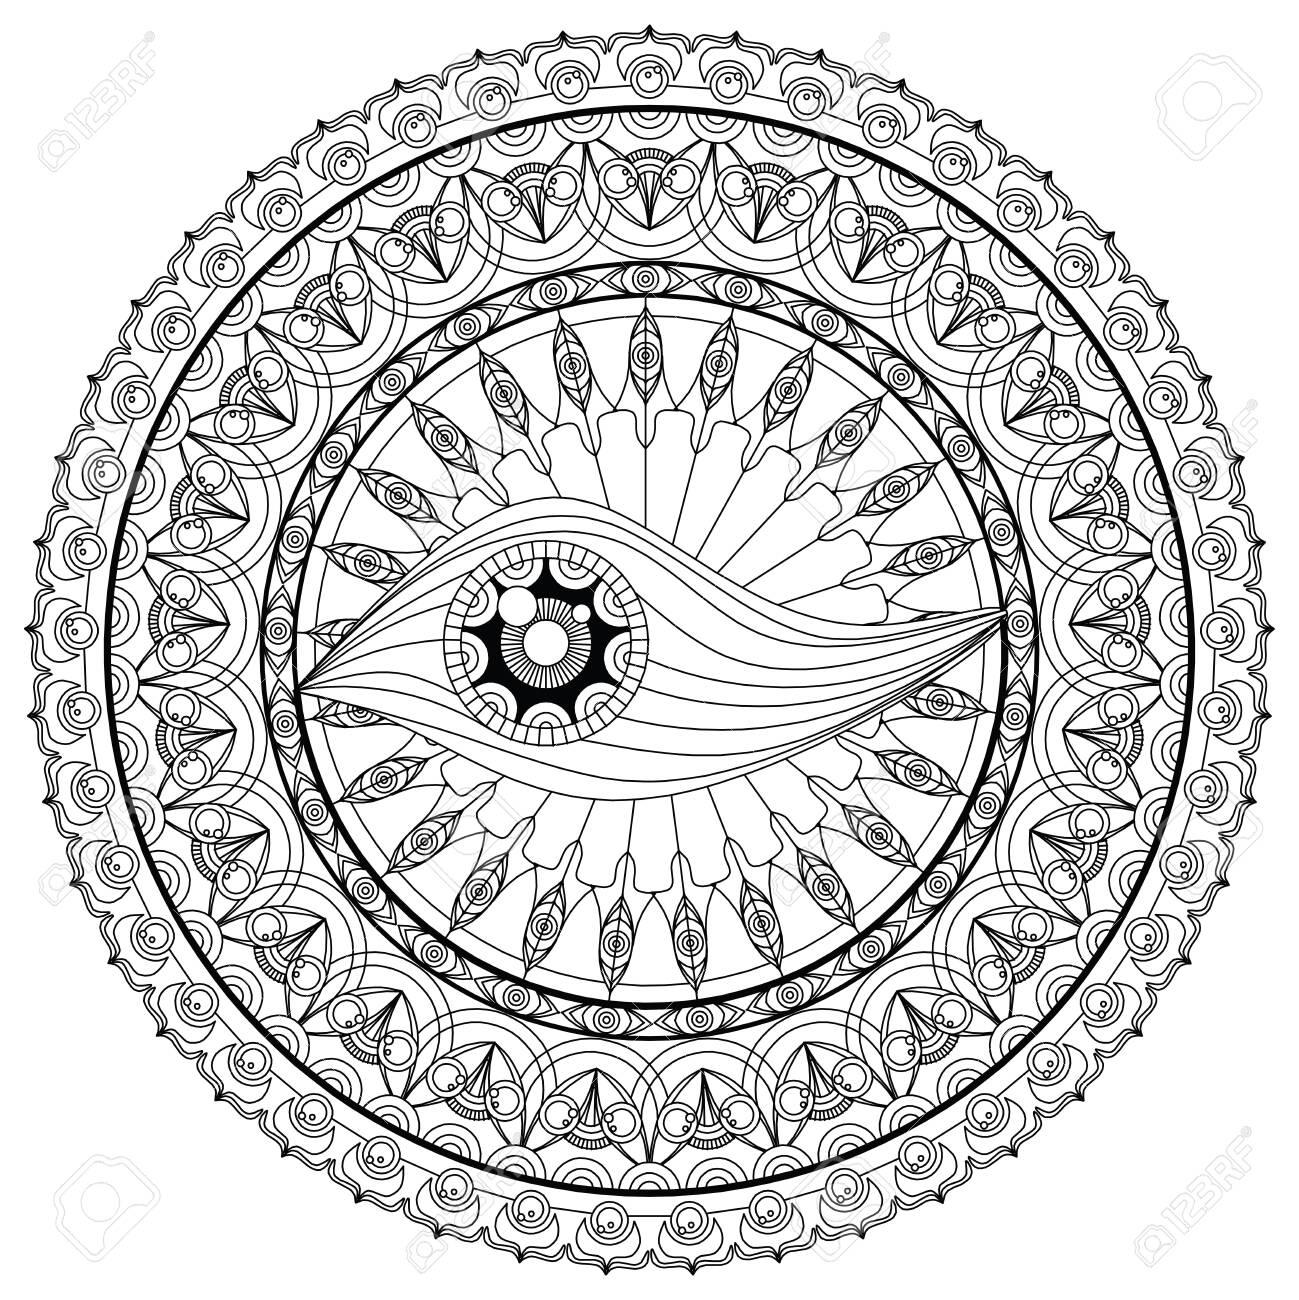 Mandala Coloring Page For Adult Relaxation Mandala Design Eye